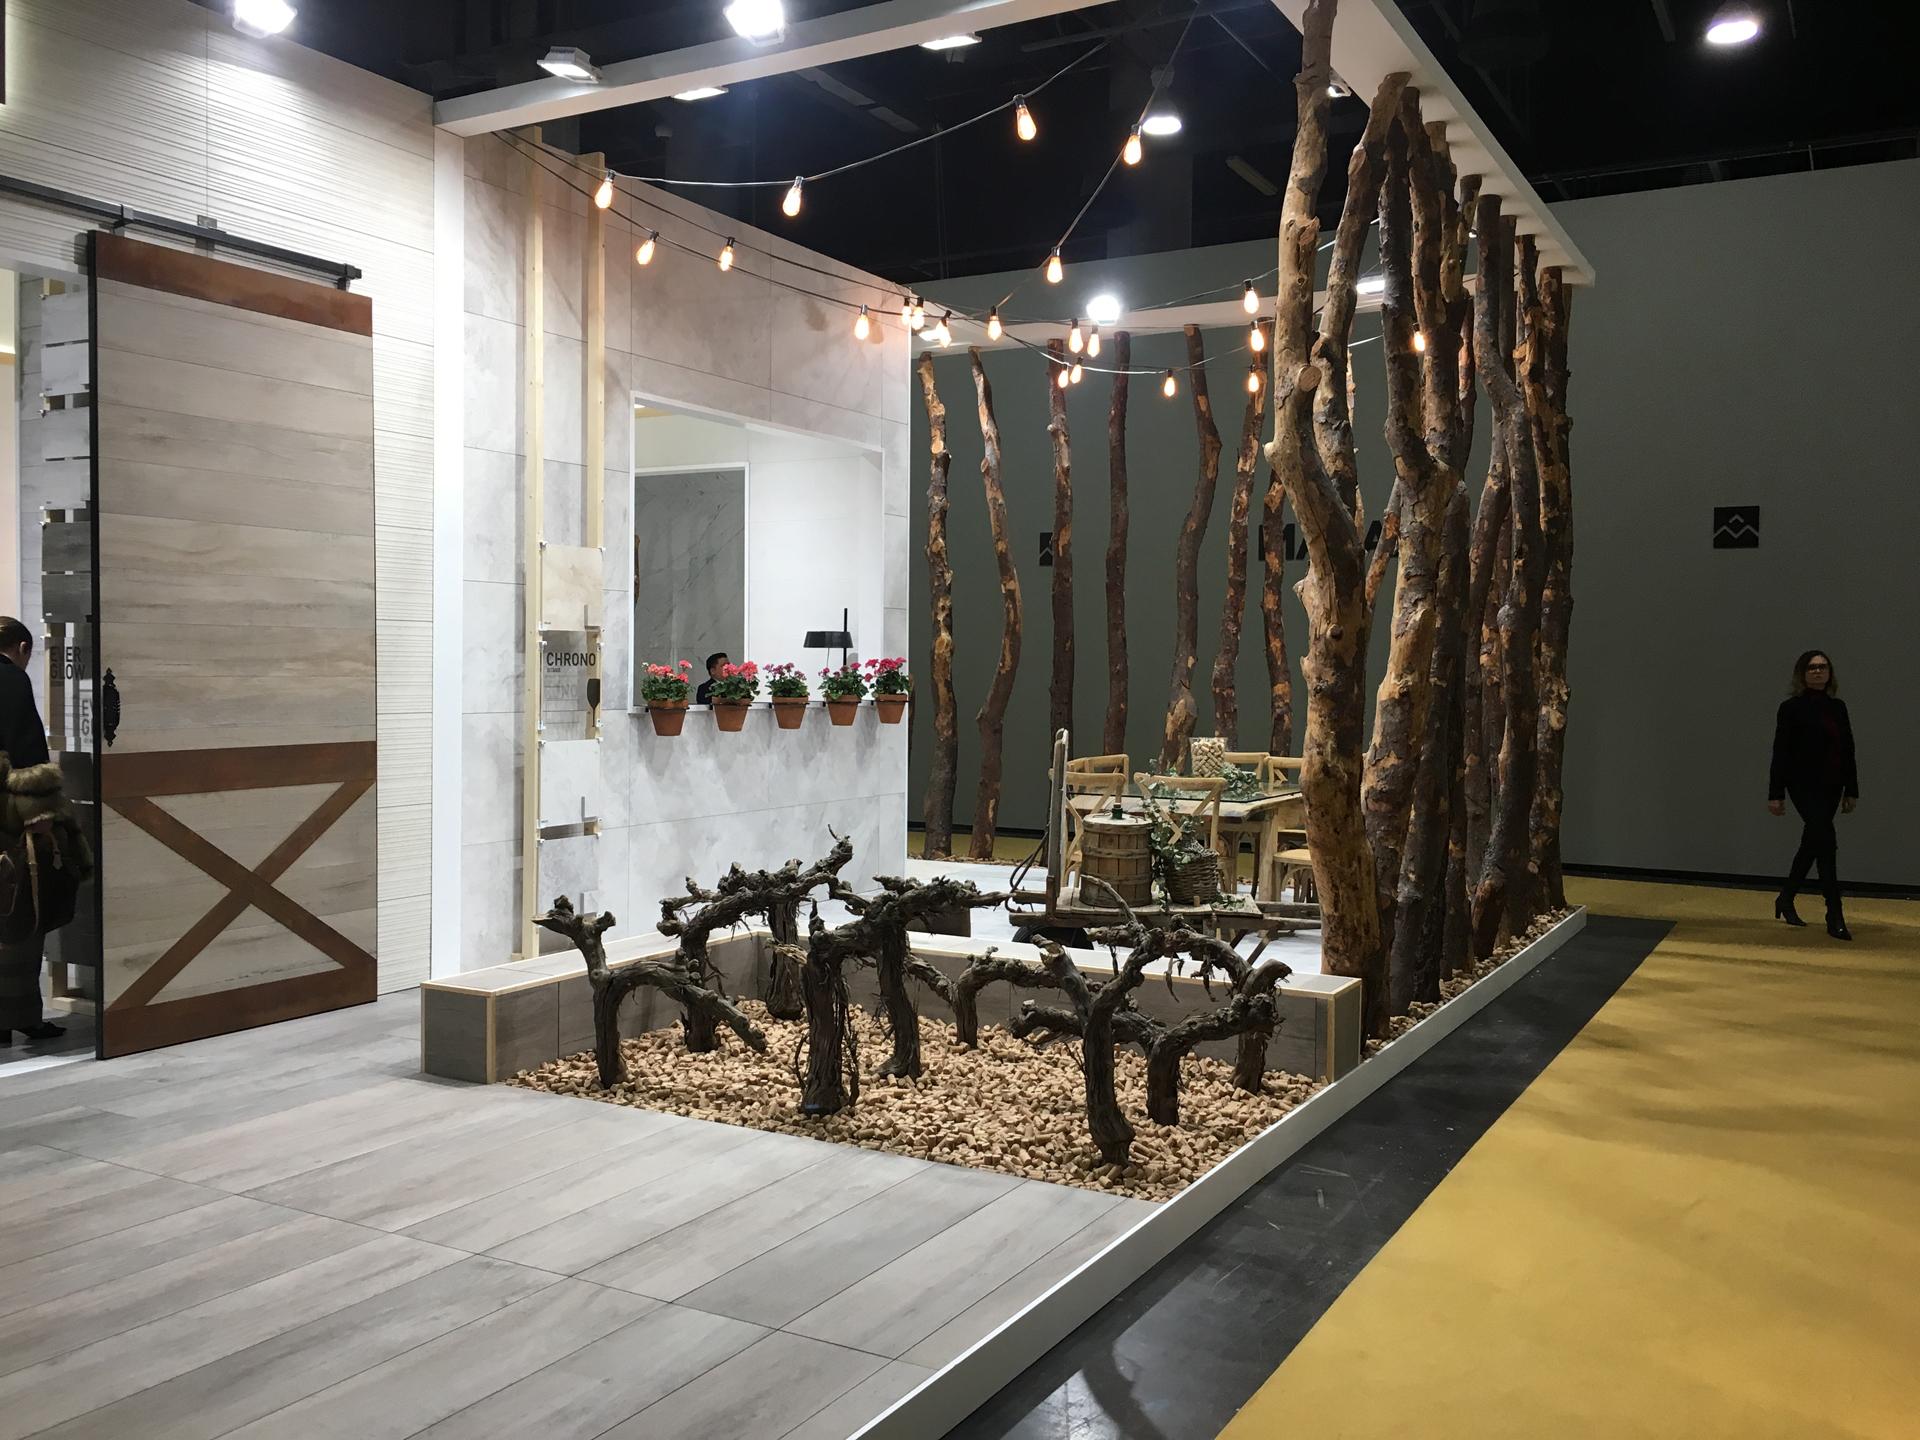 feria-cevisama-valencia-2018-decoracion-interiorismo-11